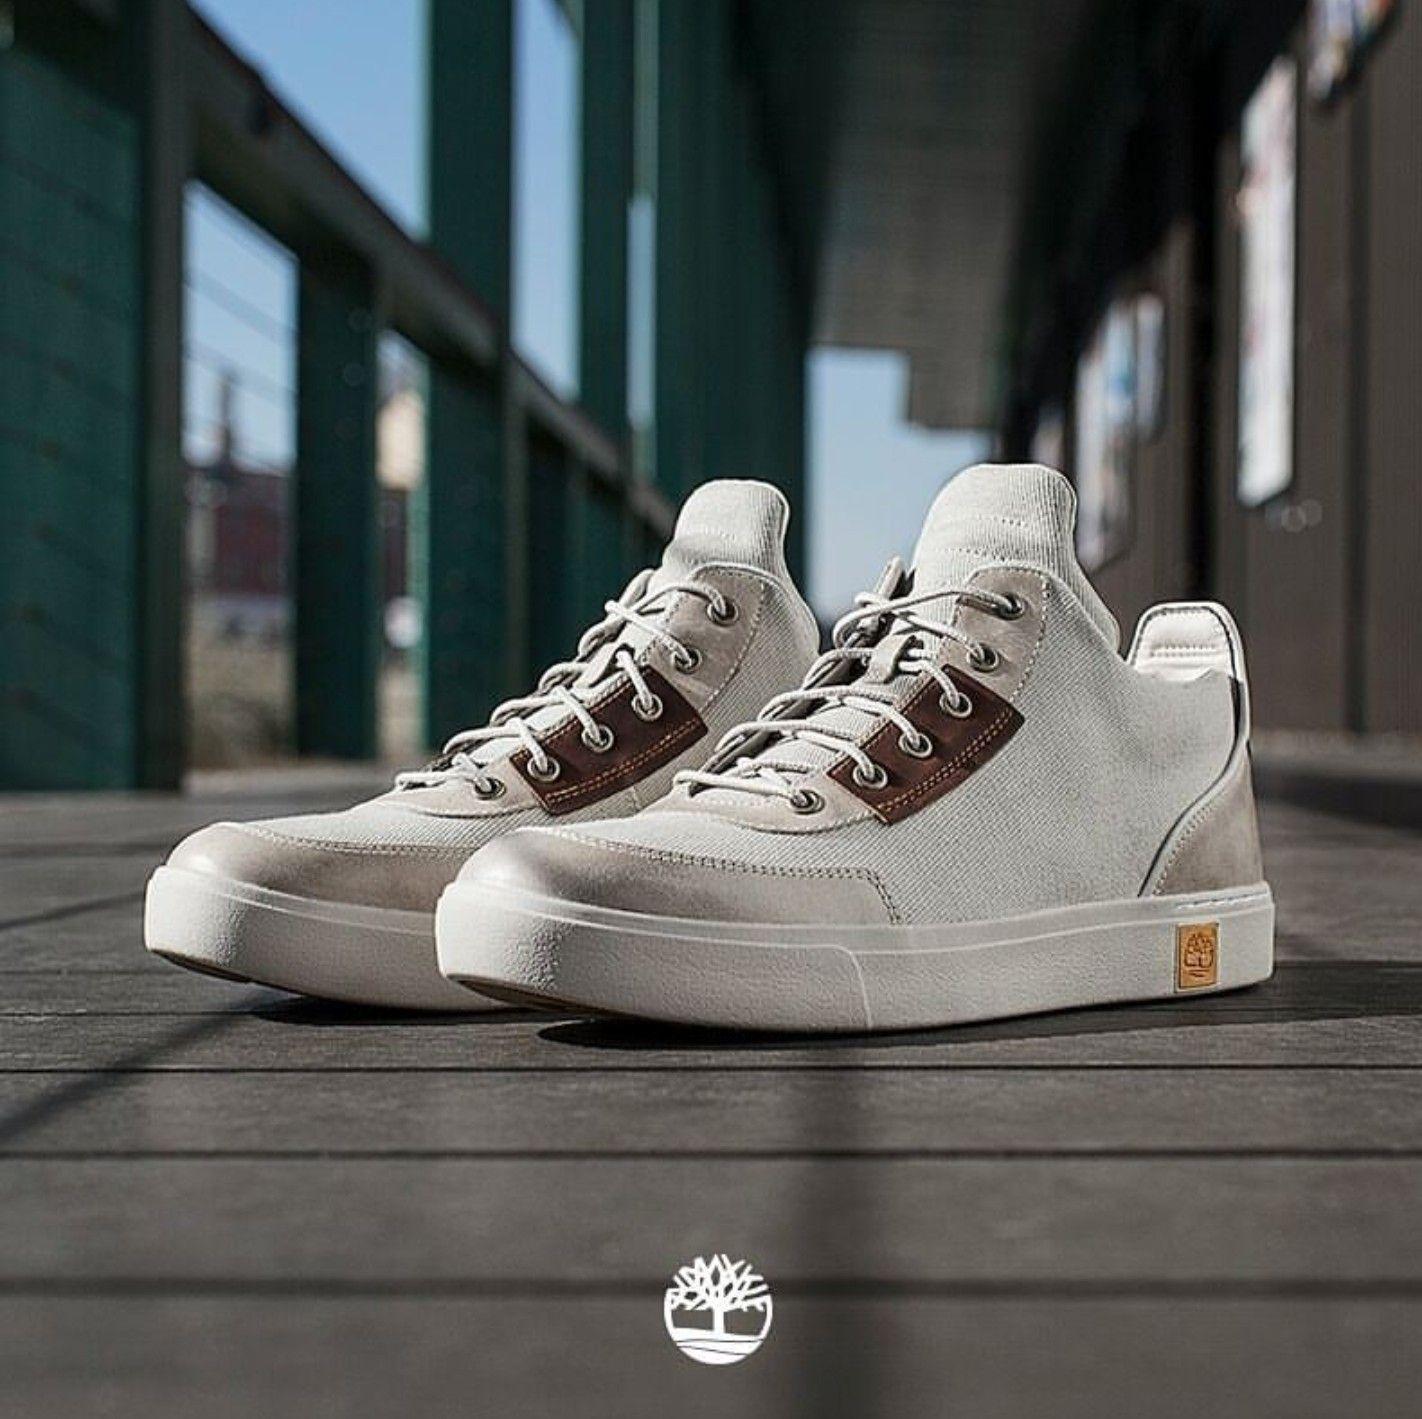 grosor Detallado Hormiga  Timberland SENSORFLEX COMFORT SYSTEM | Timberland, Converse sneaker,  Sneakers